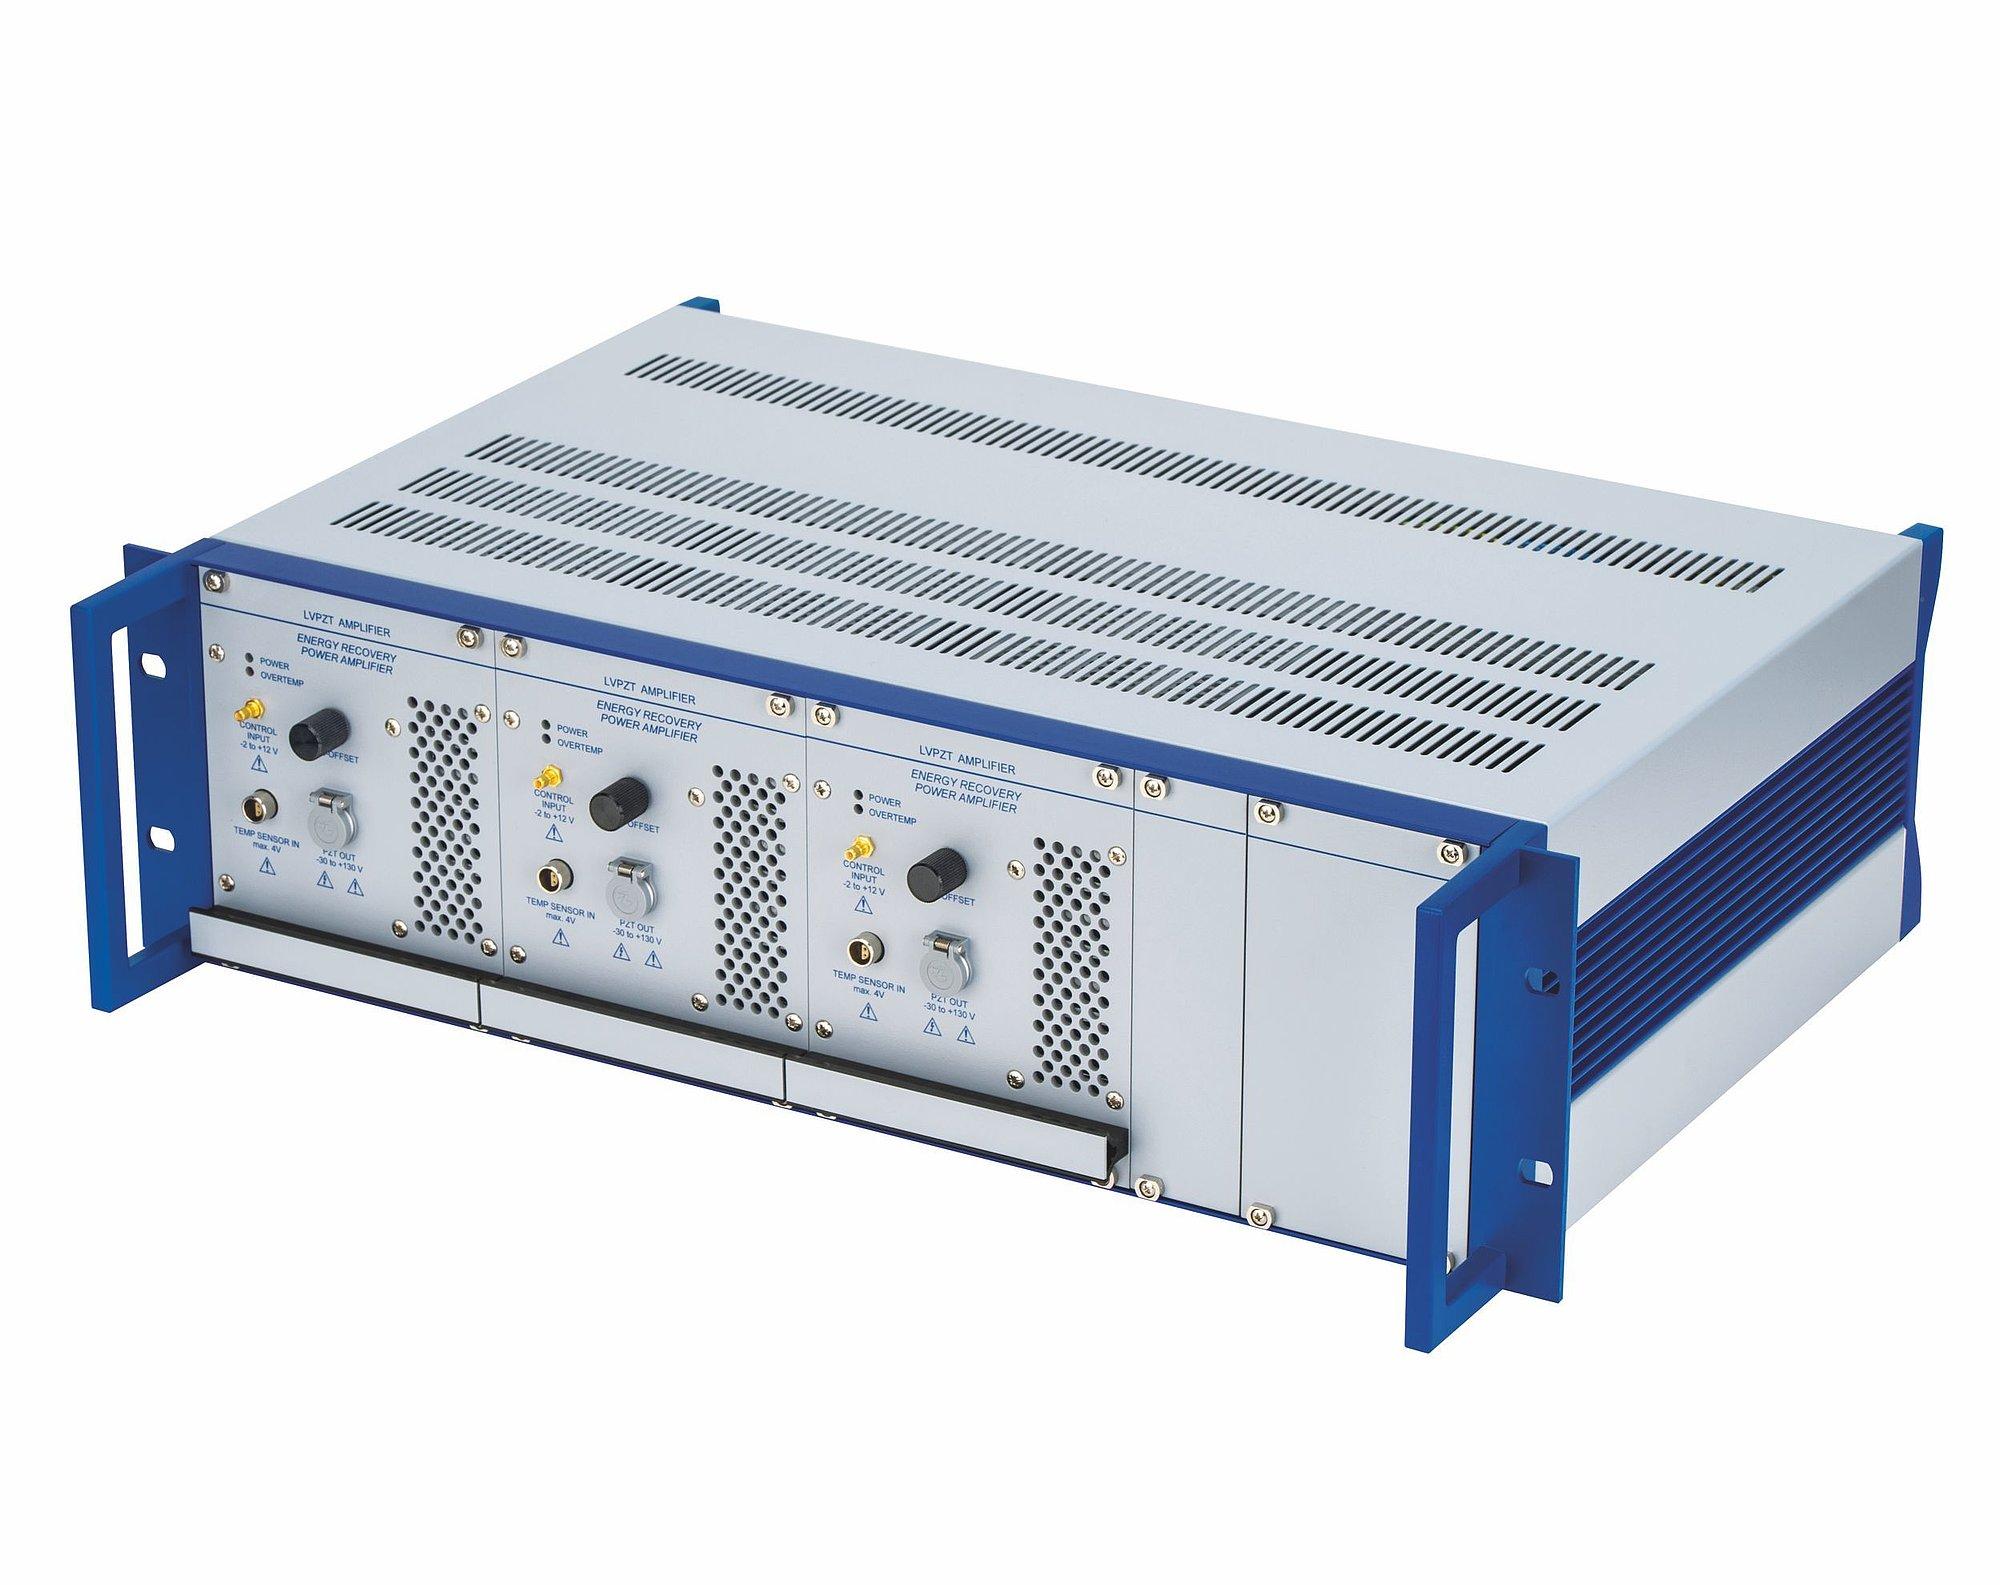 E-619 用于压电陶瓷促动器的大功率放大器